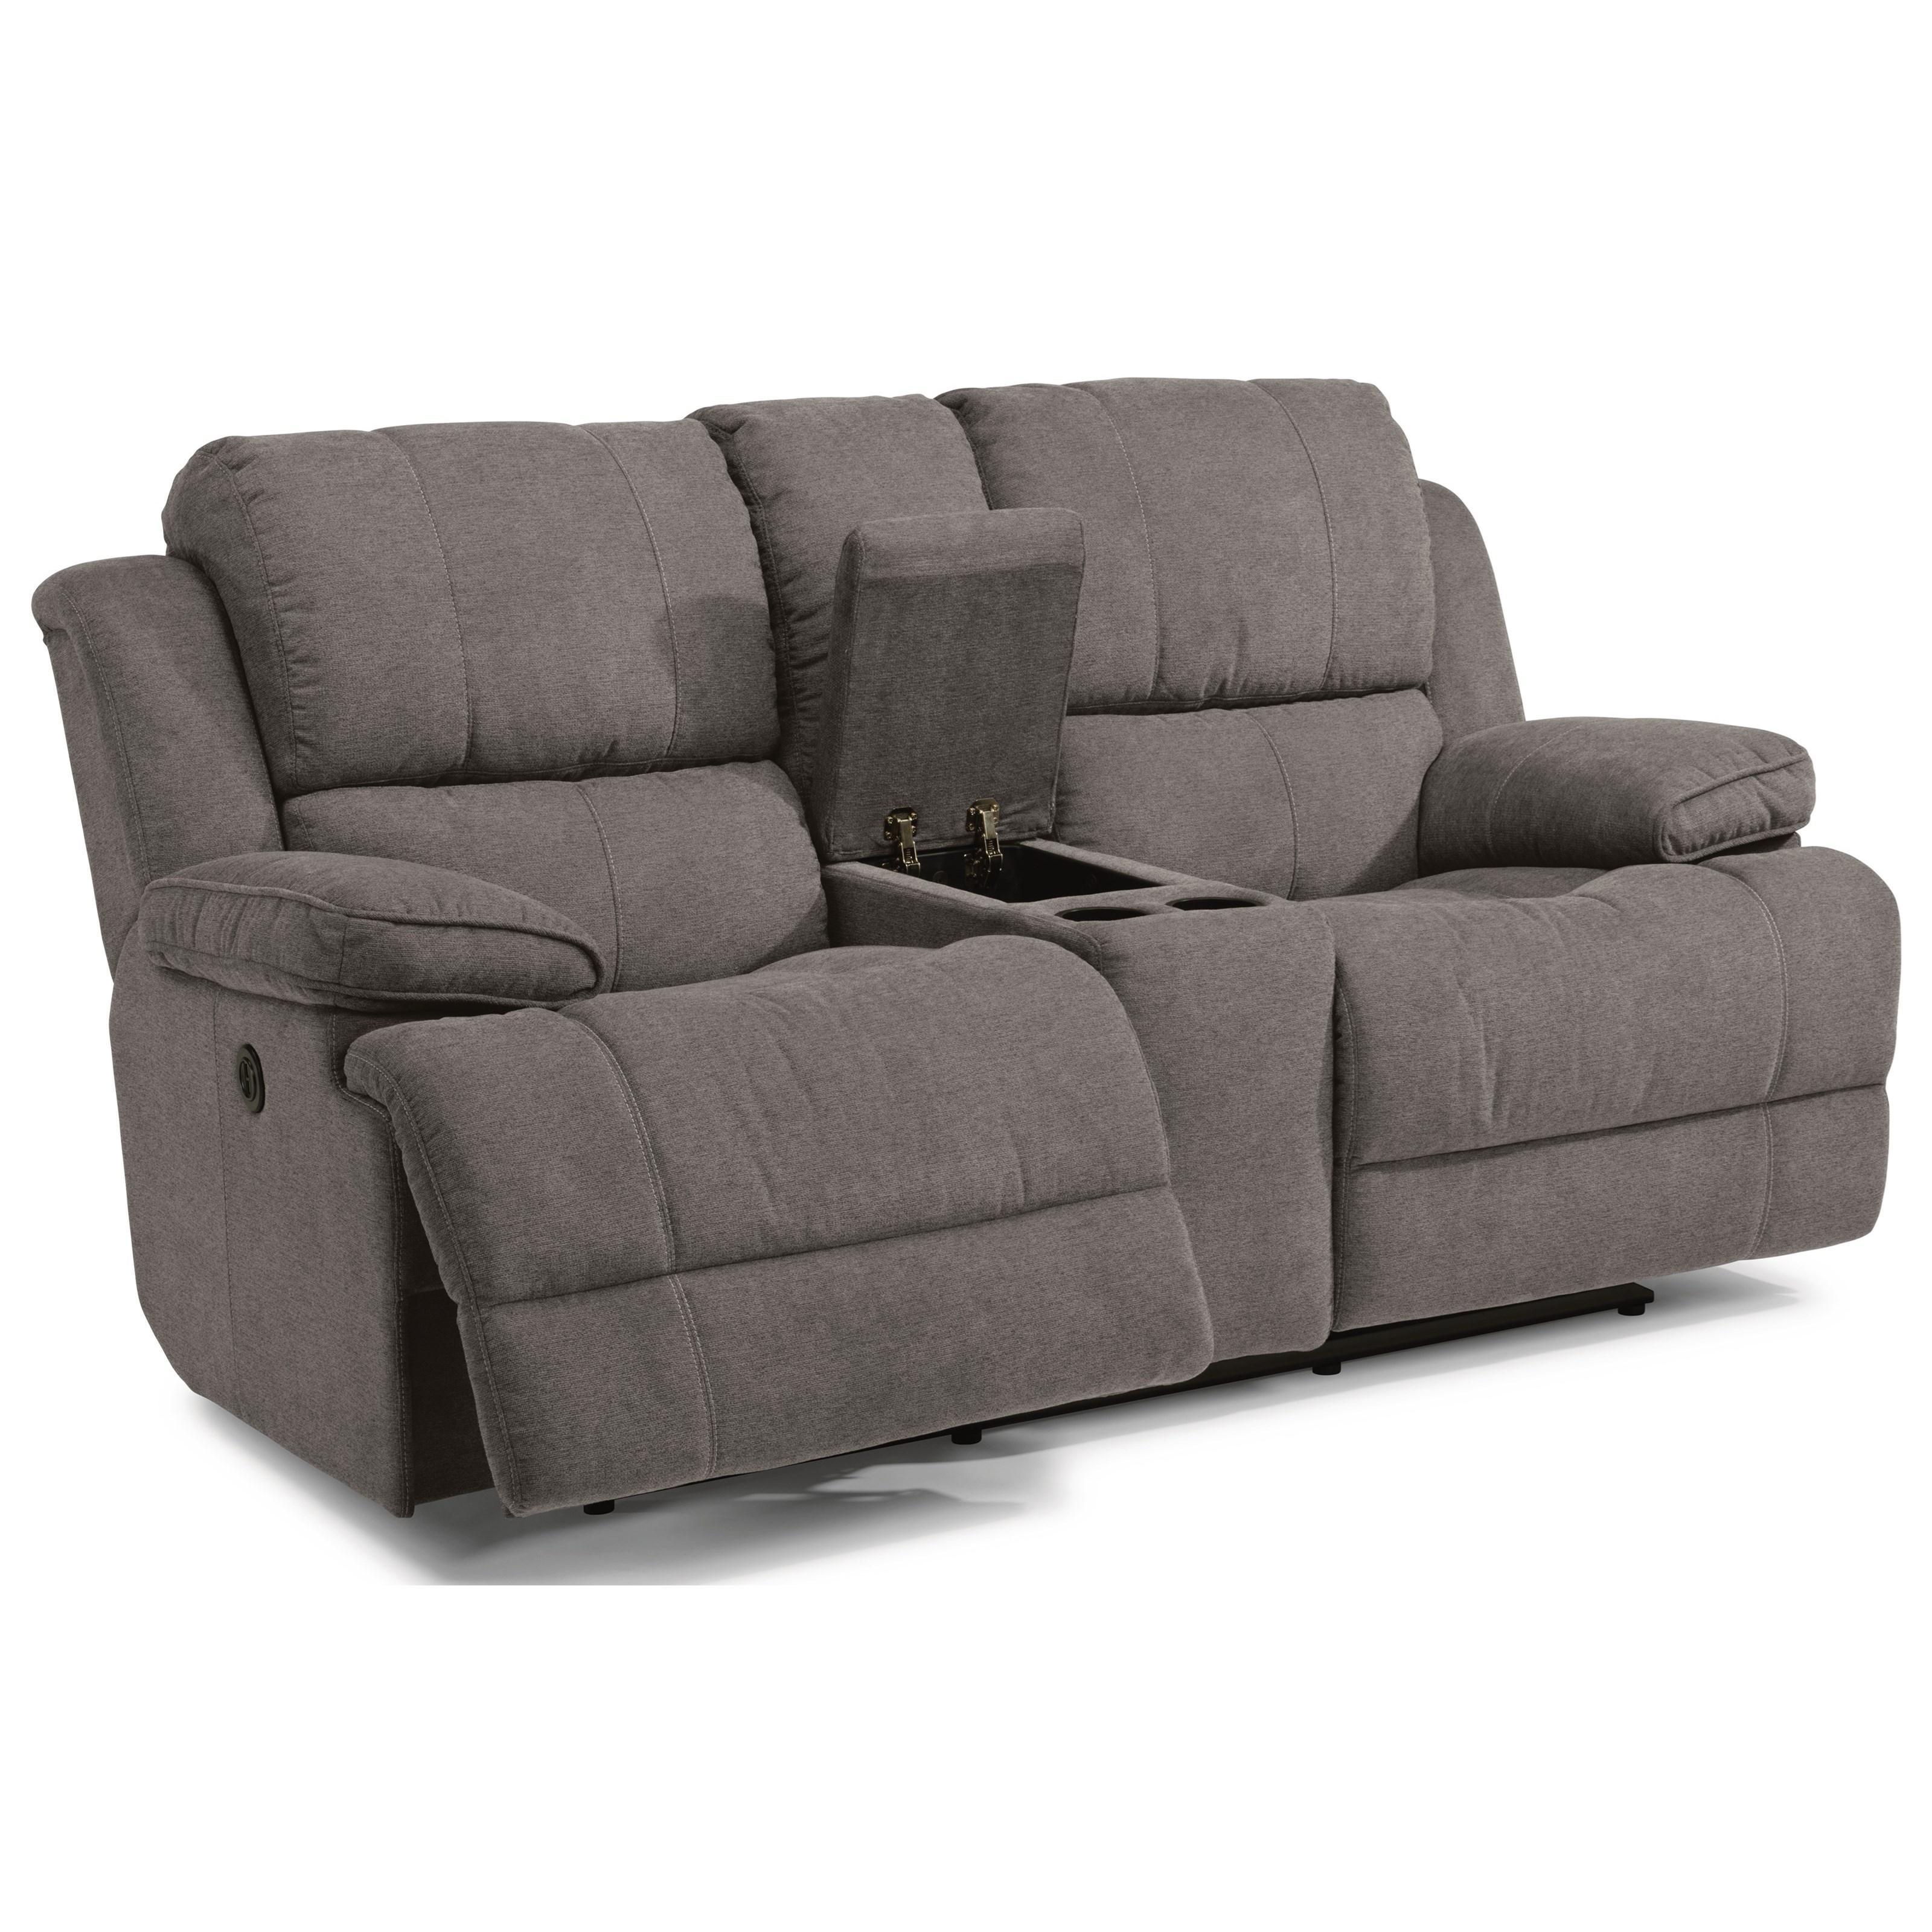 loveseat reclining best latitudes sofa flexsteel of rocking furniture beautiful